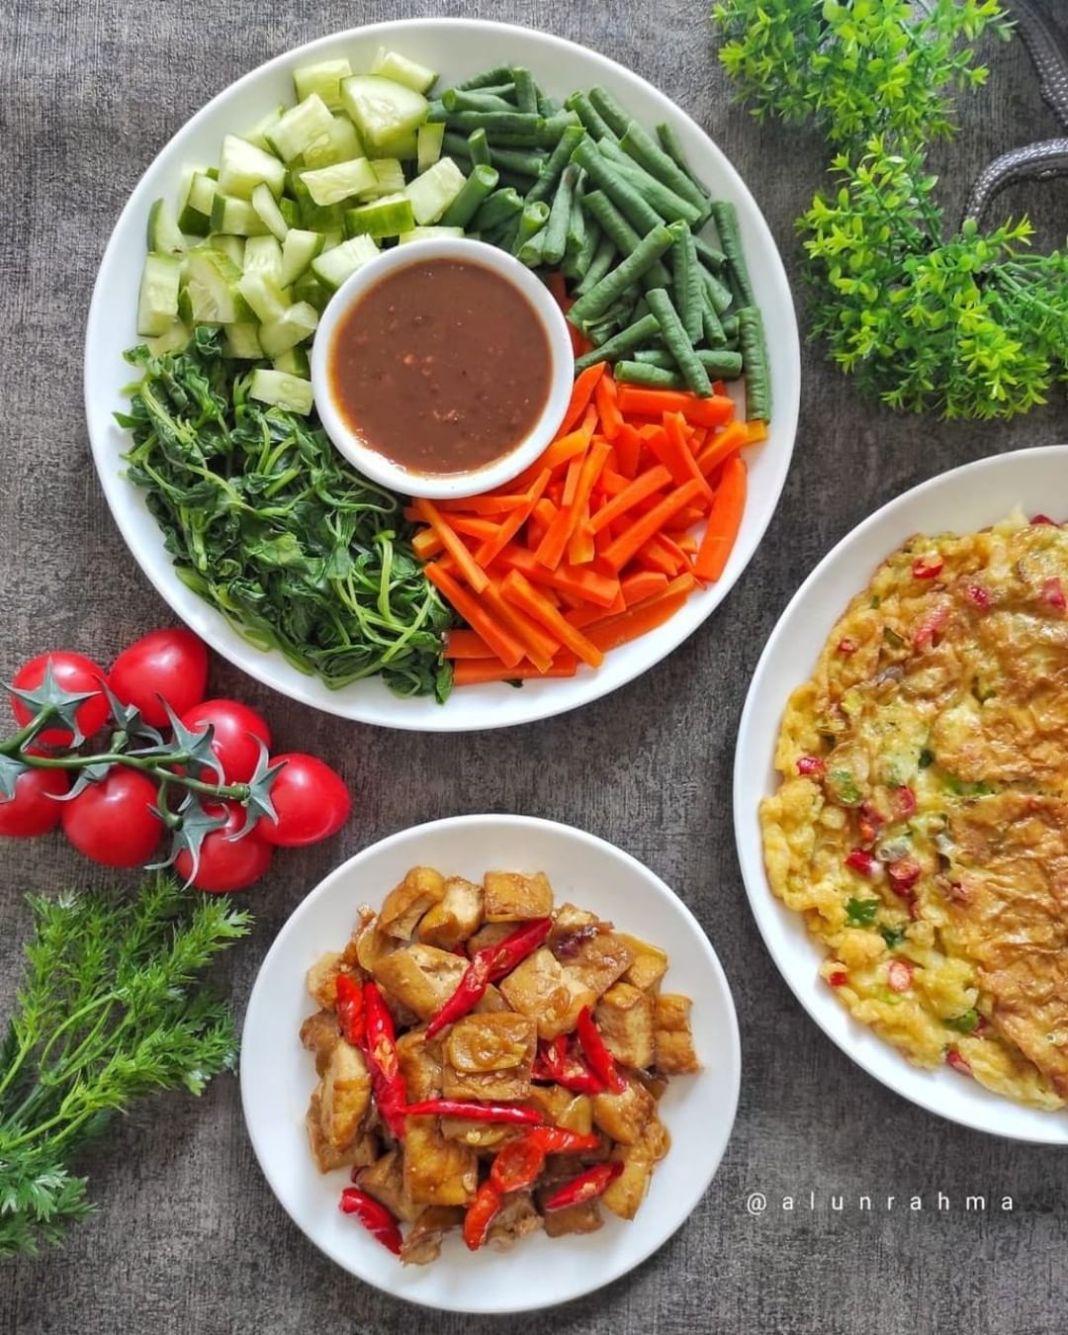 Info kuliner, sayurnya kita masak pecel sayur, bumbunya dibawain mertua dari magelang, untuk resepnya dapat ce…